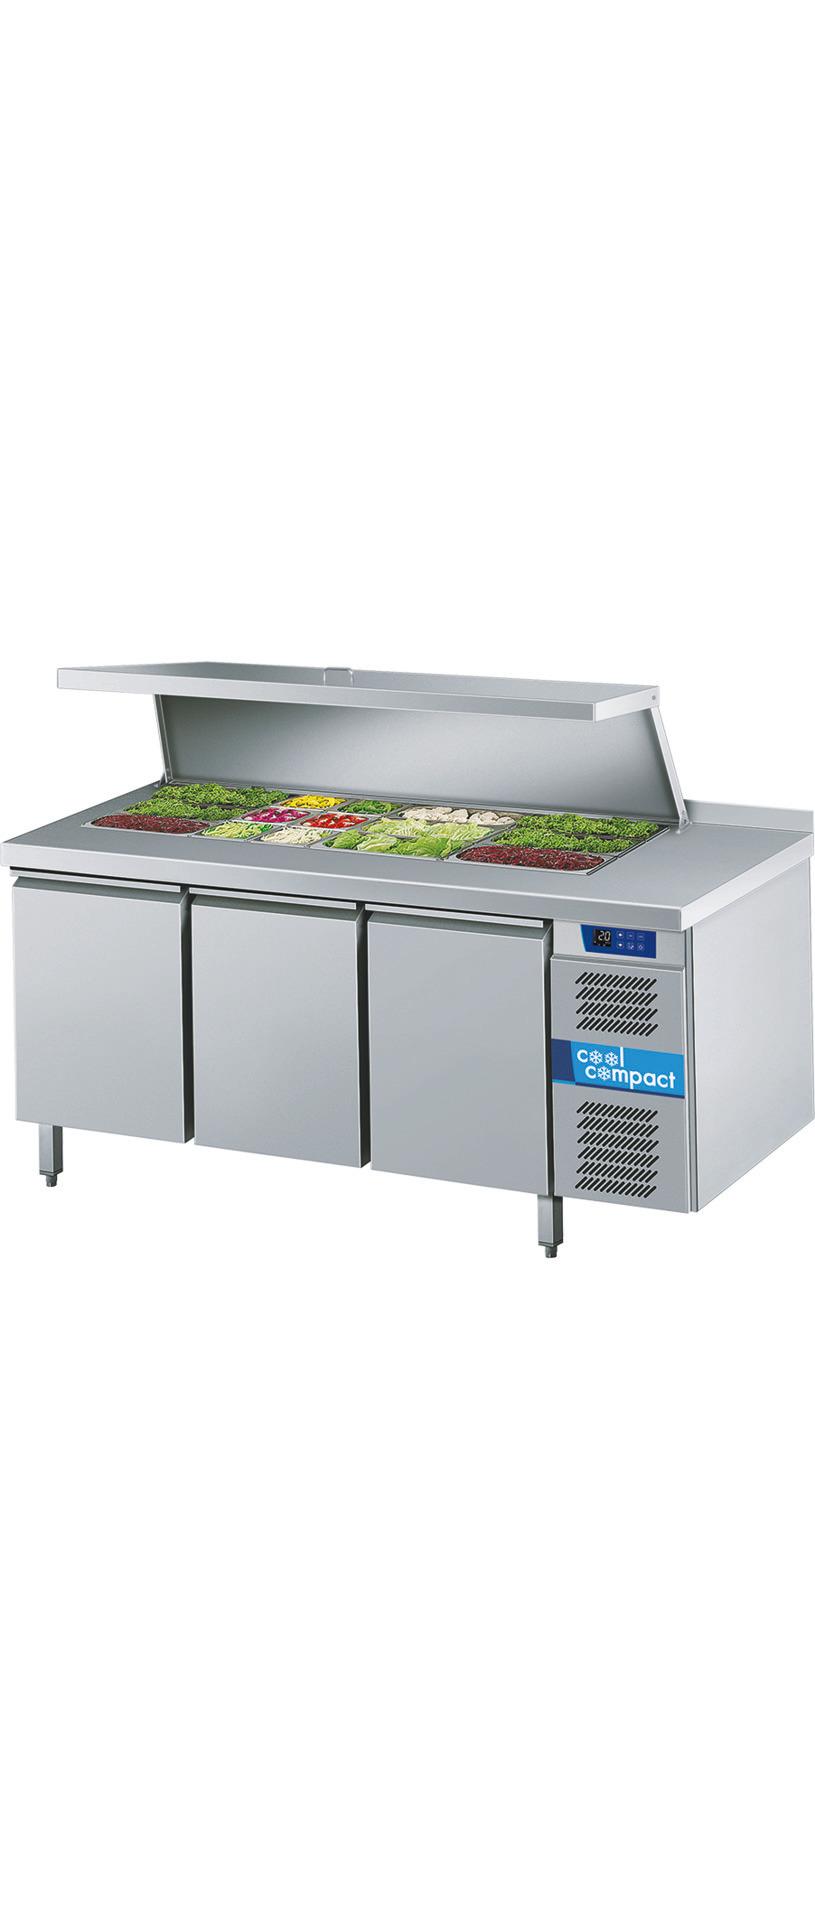 Saladette 3 Türen je 10 x GN 1/1 /  ohne Tischplatte / zentralgekühlt